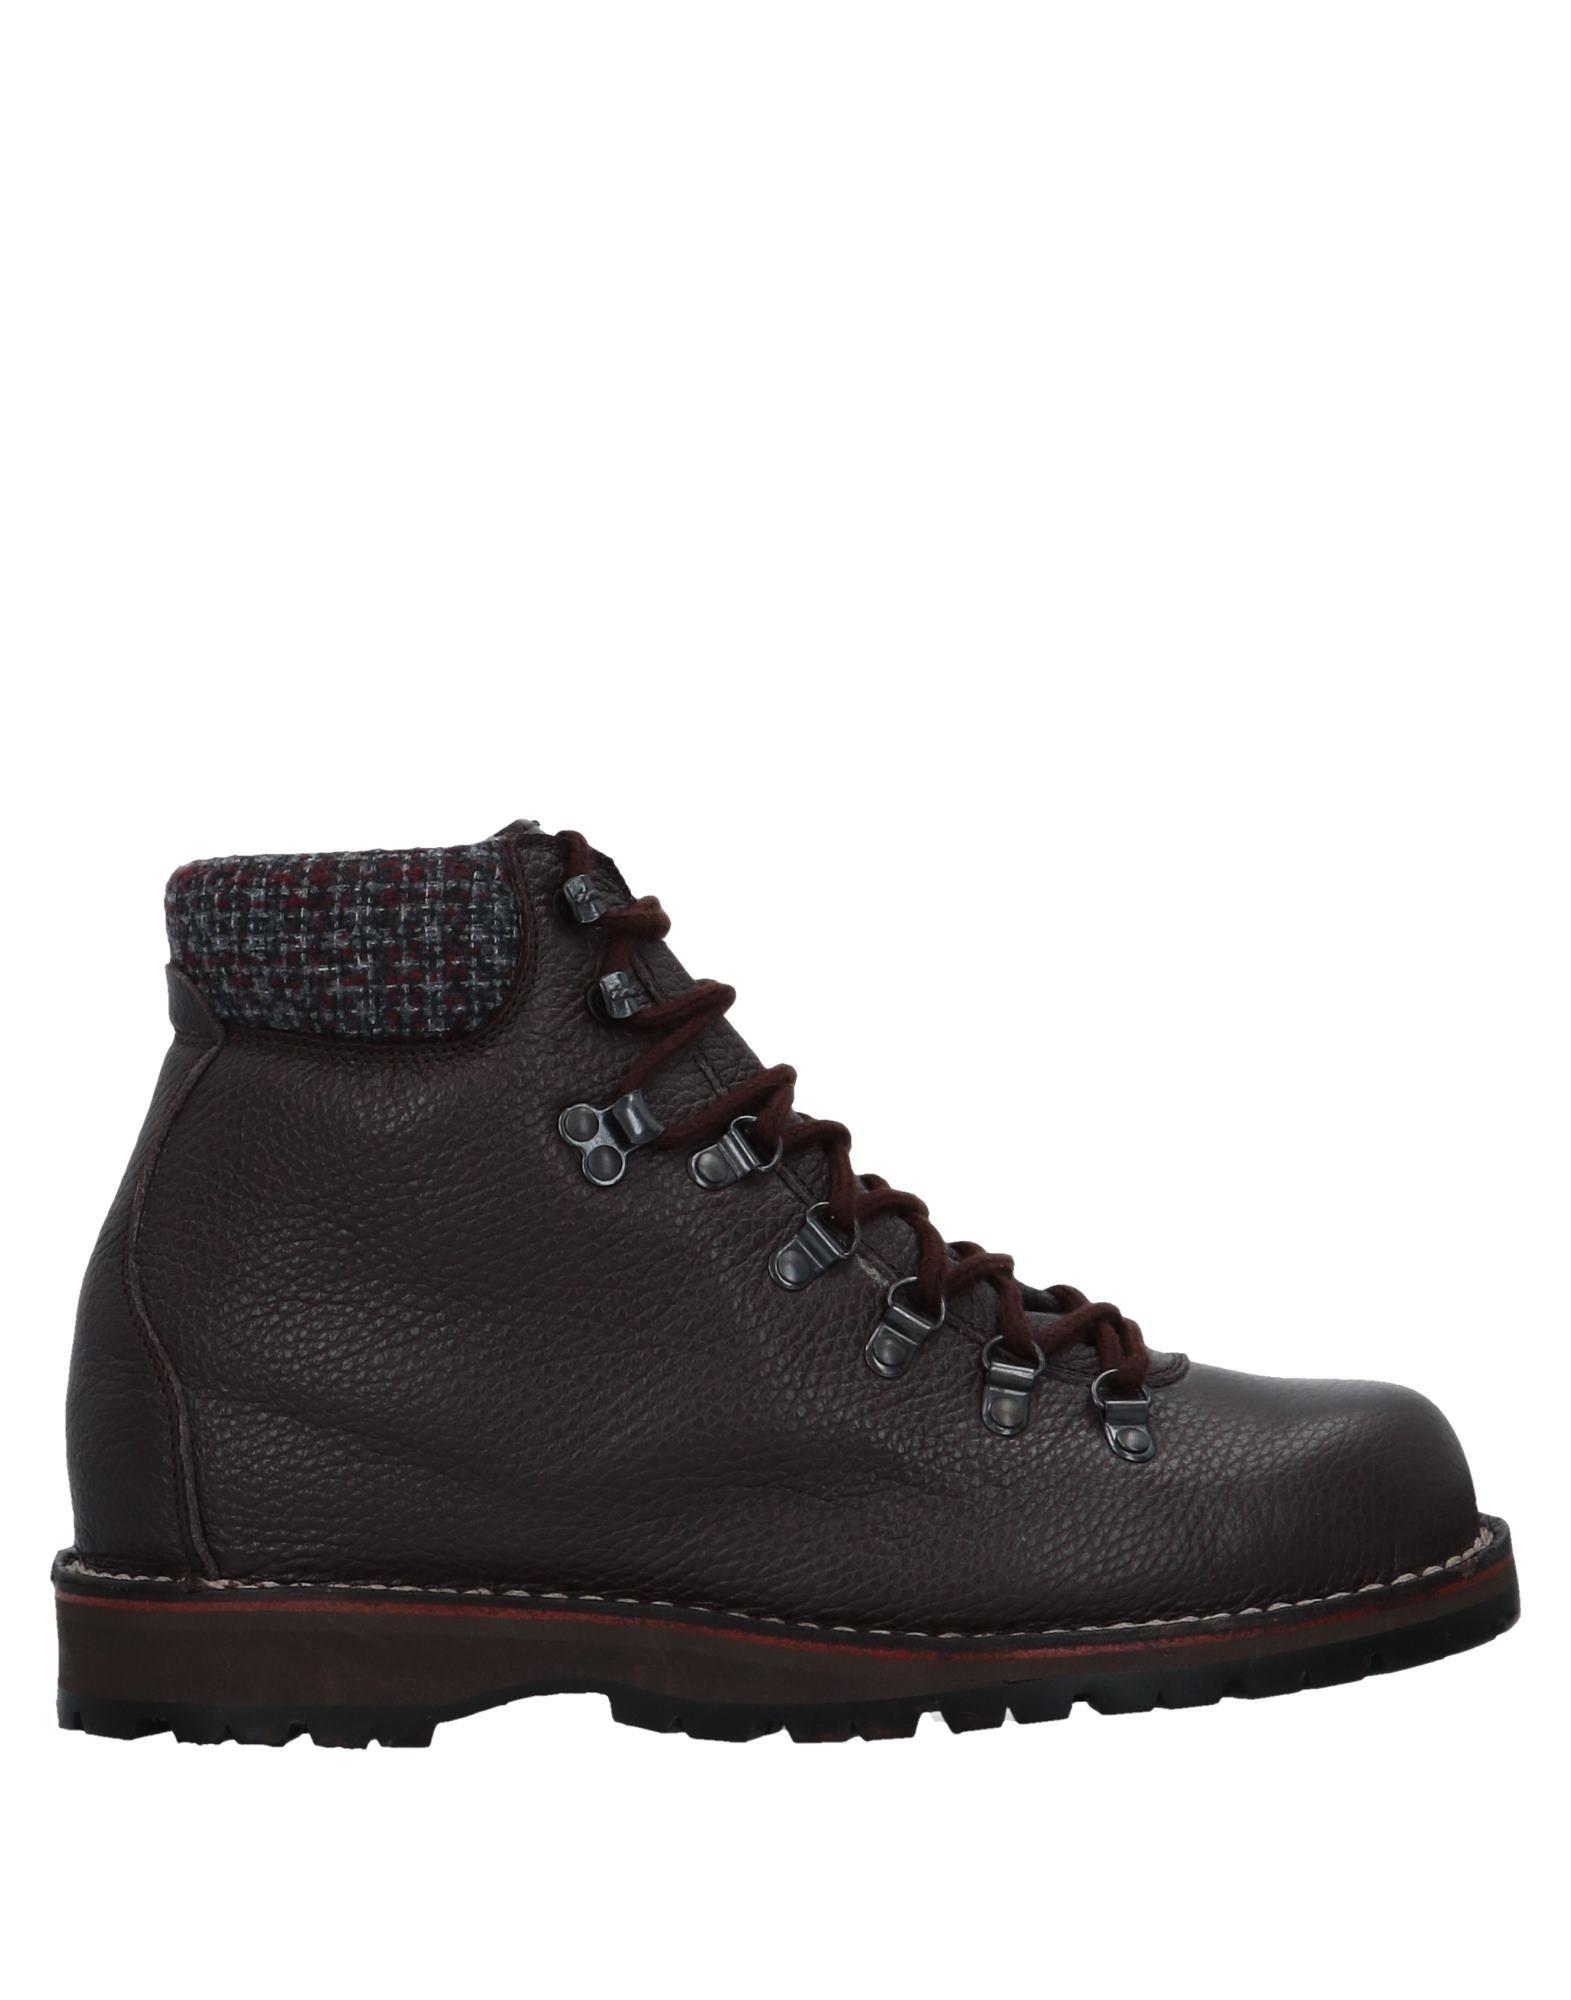 Le Cortina By Andrea Ventura Stiefelette Herren  11531974QG Gute Qualität beliebte Schuhe